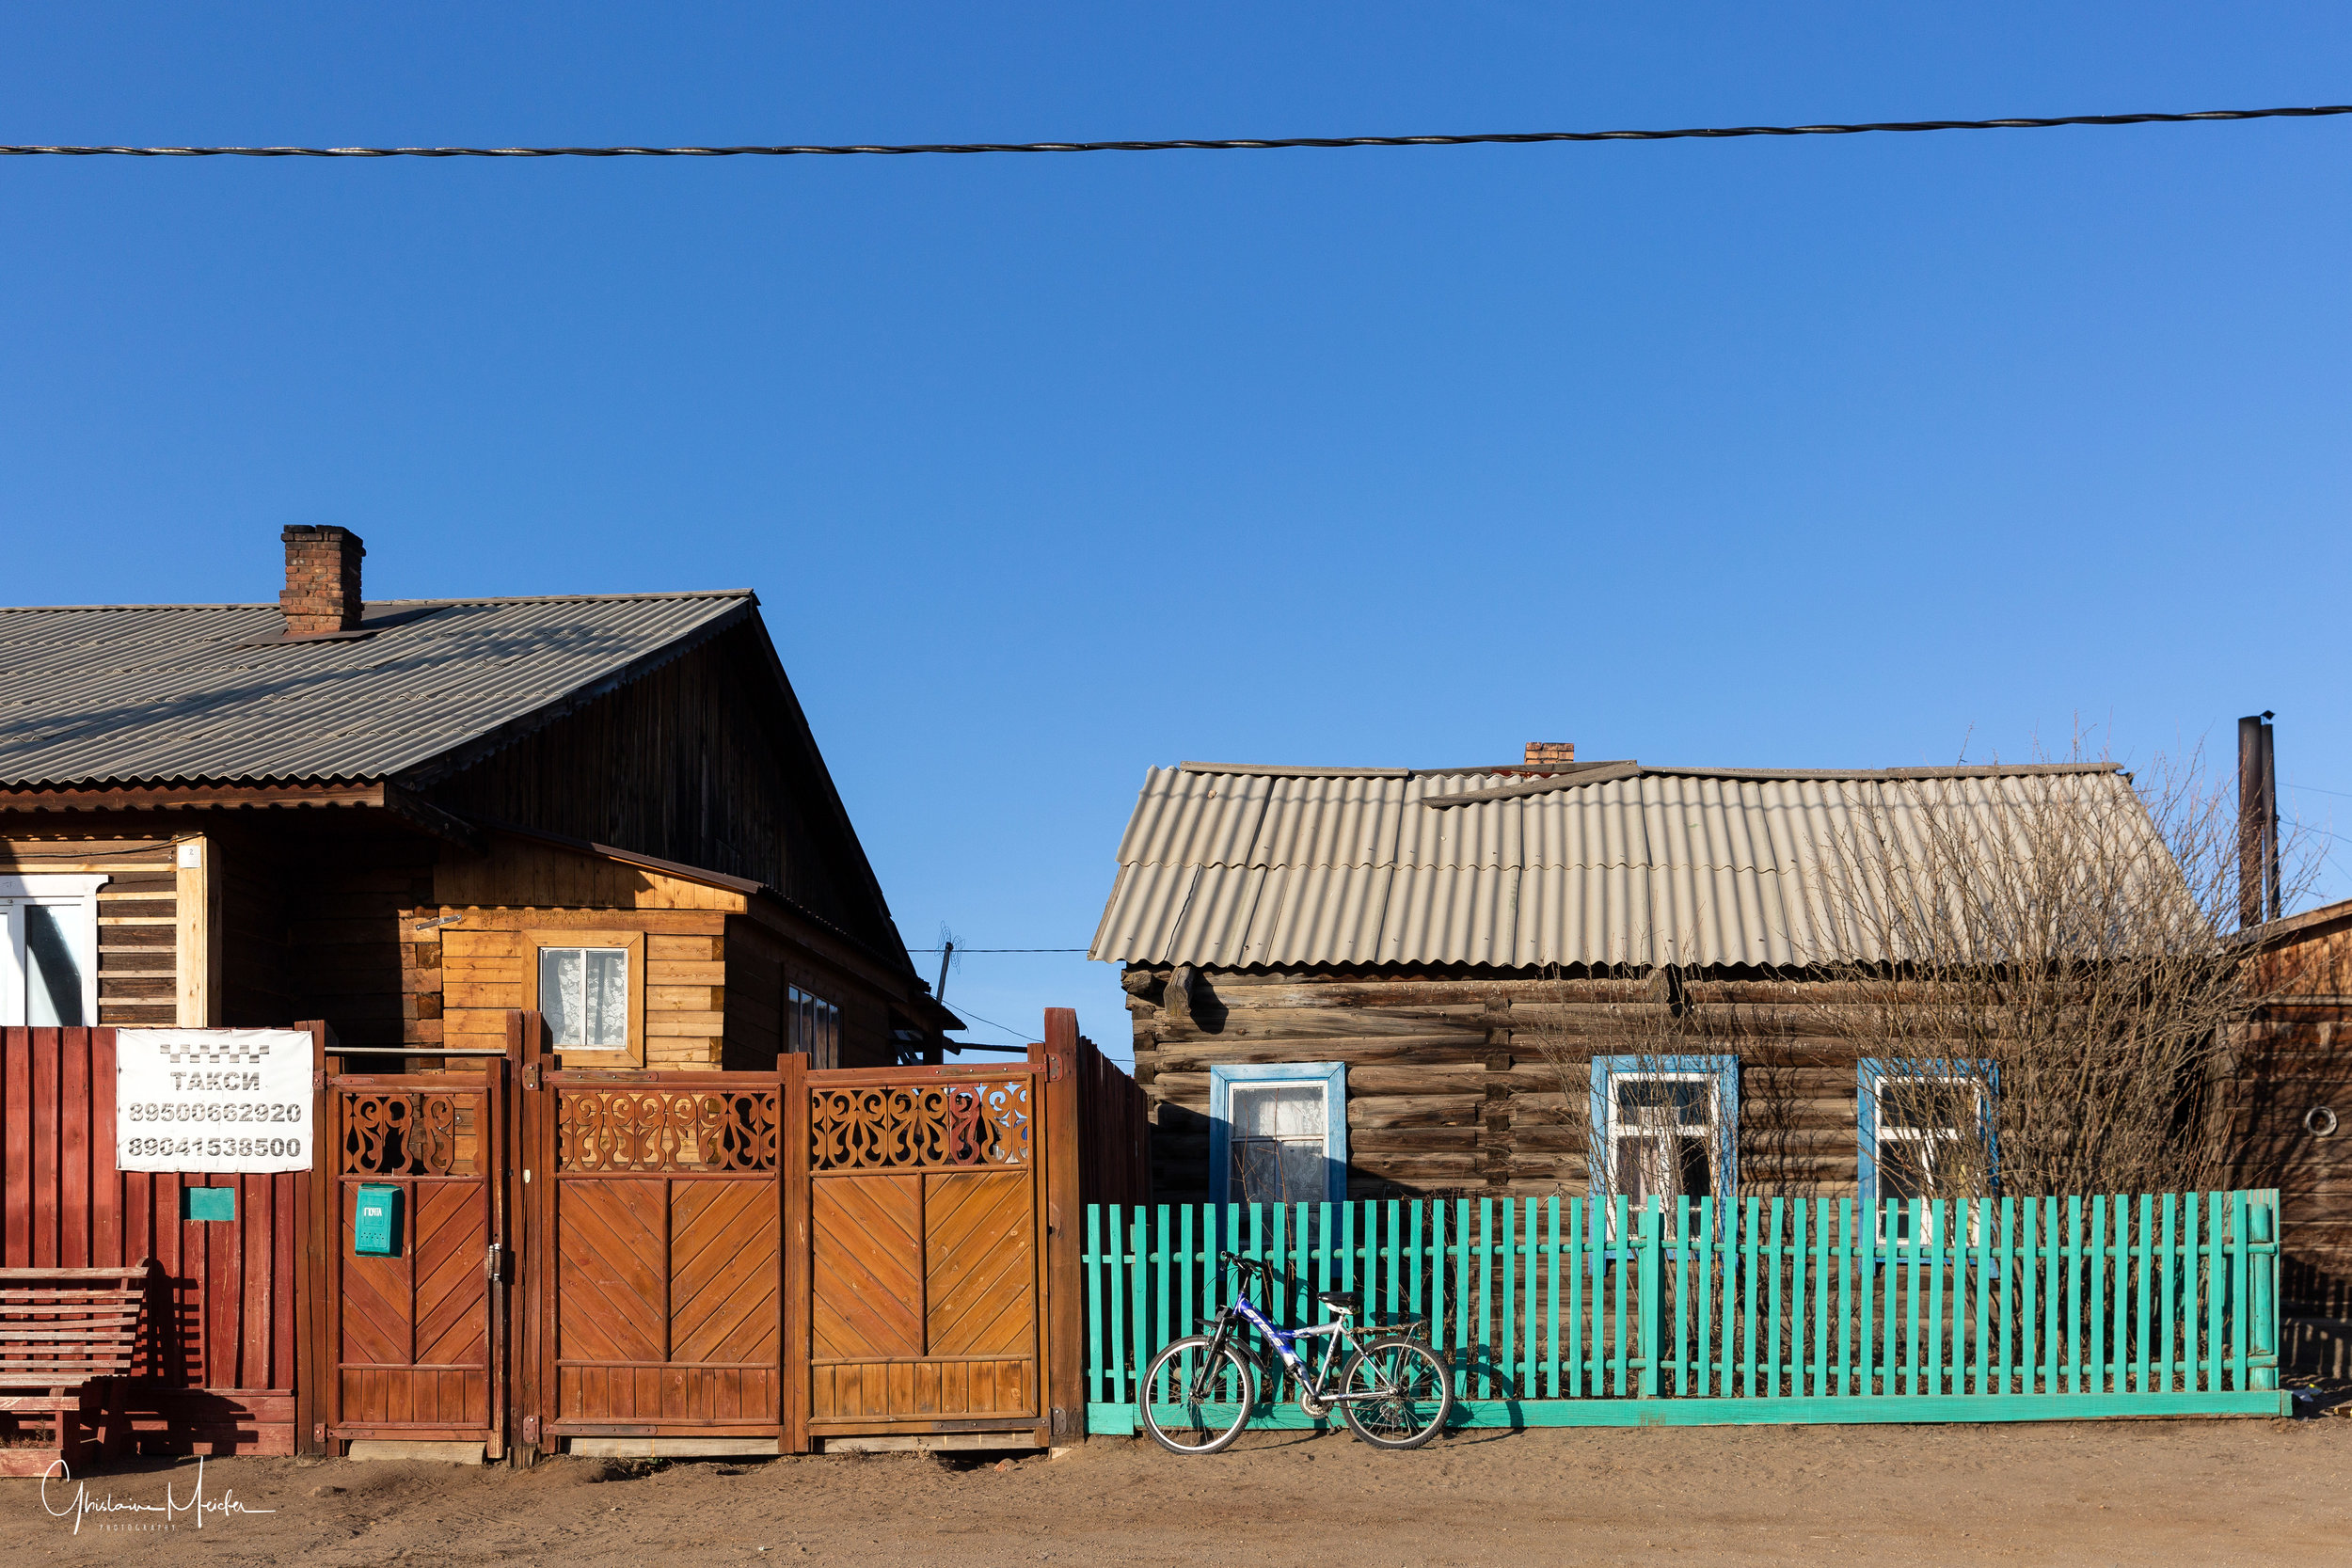 Baikal-65299-Modifier.jpg